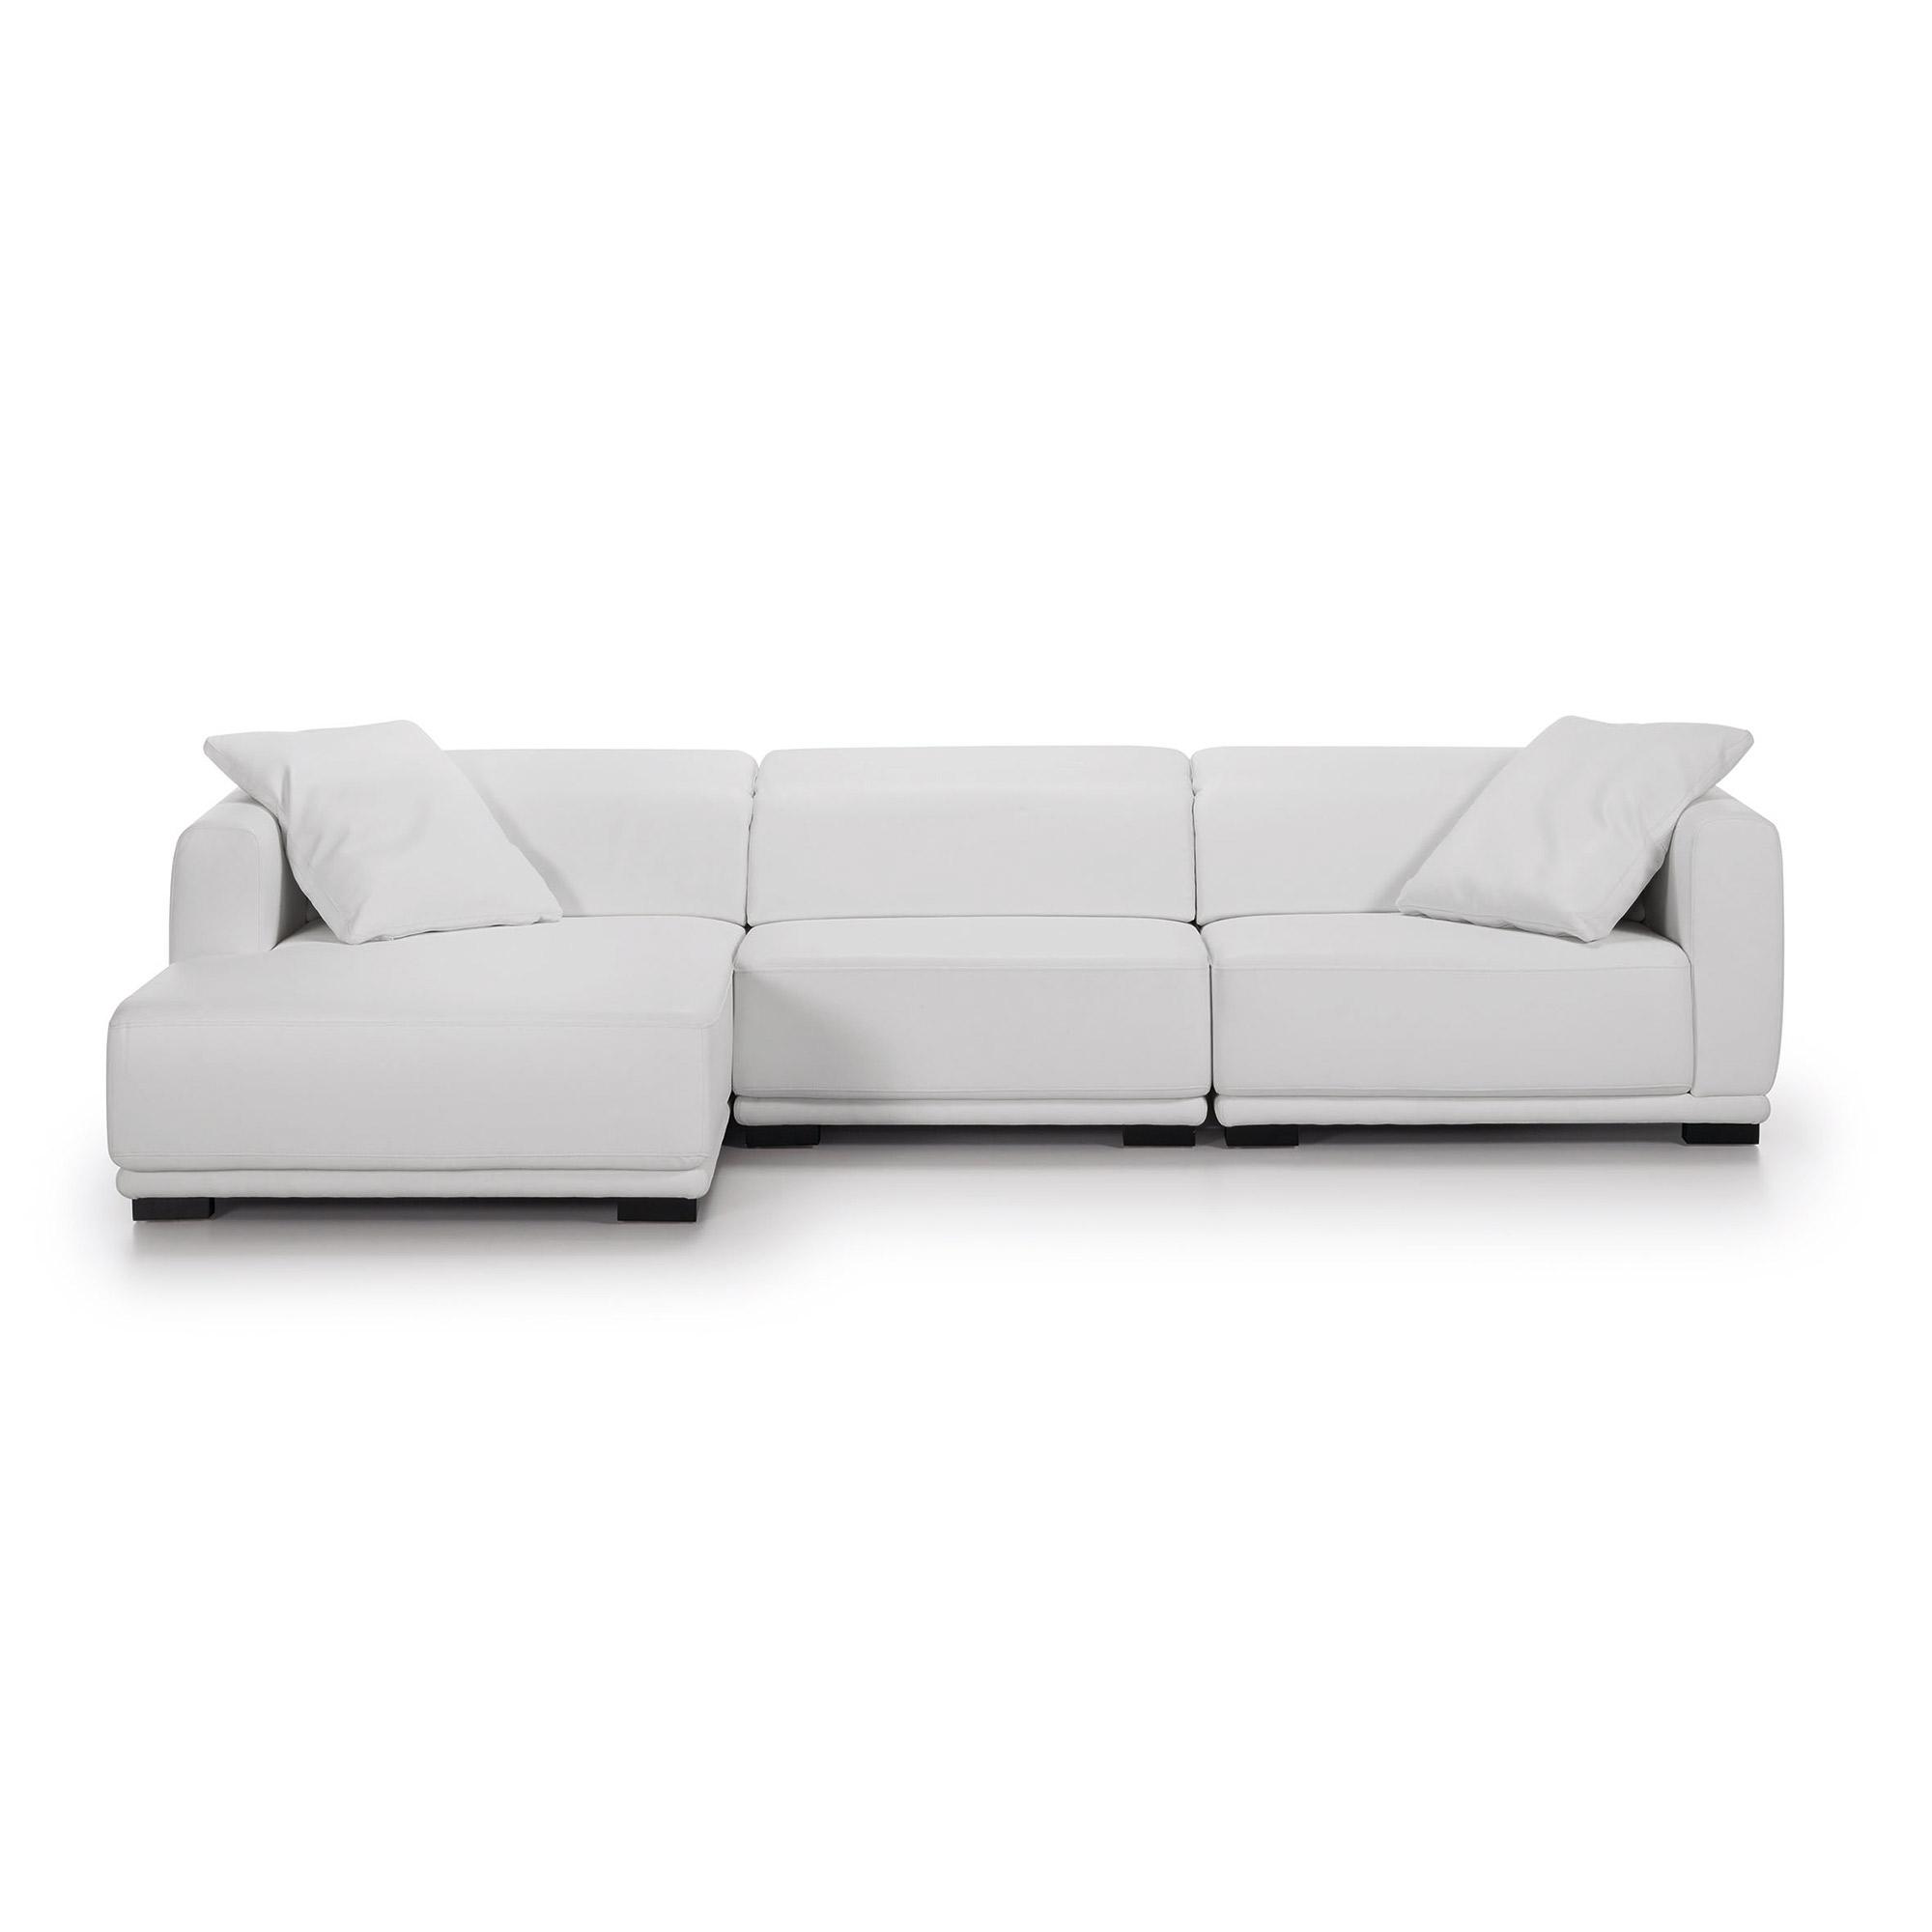 italy sofa 3p chaise izda recl eco piel blanco puro ep05. Black Bedroom Furniture Sets. Home Design Ideas